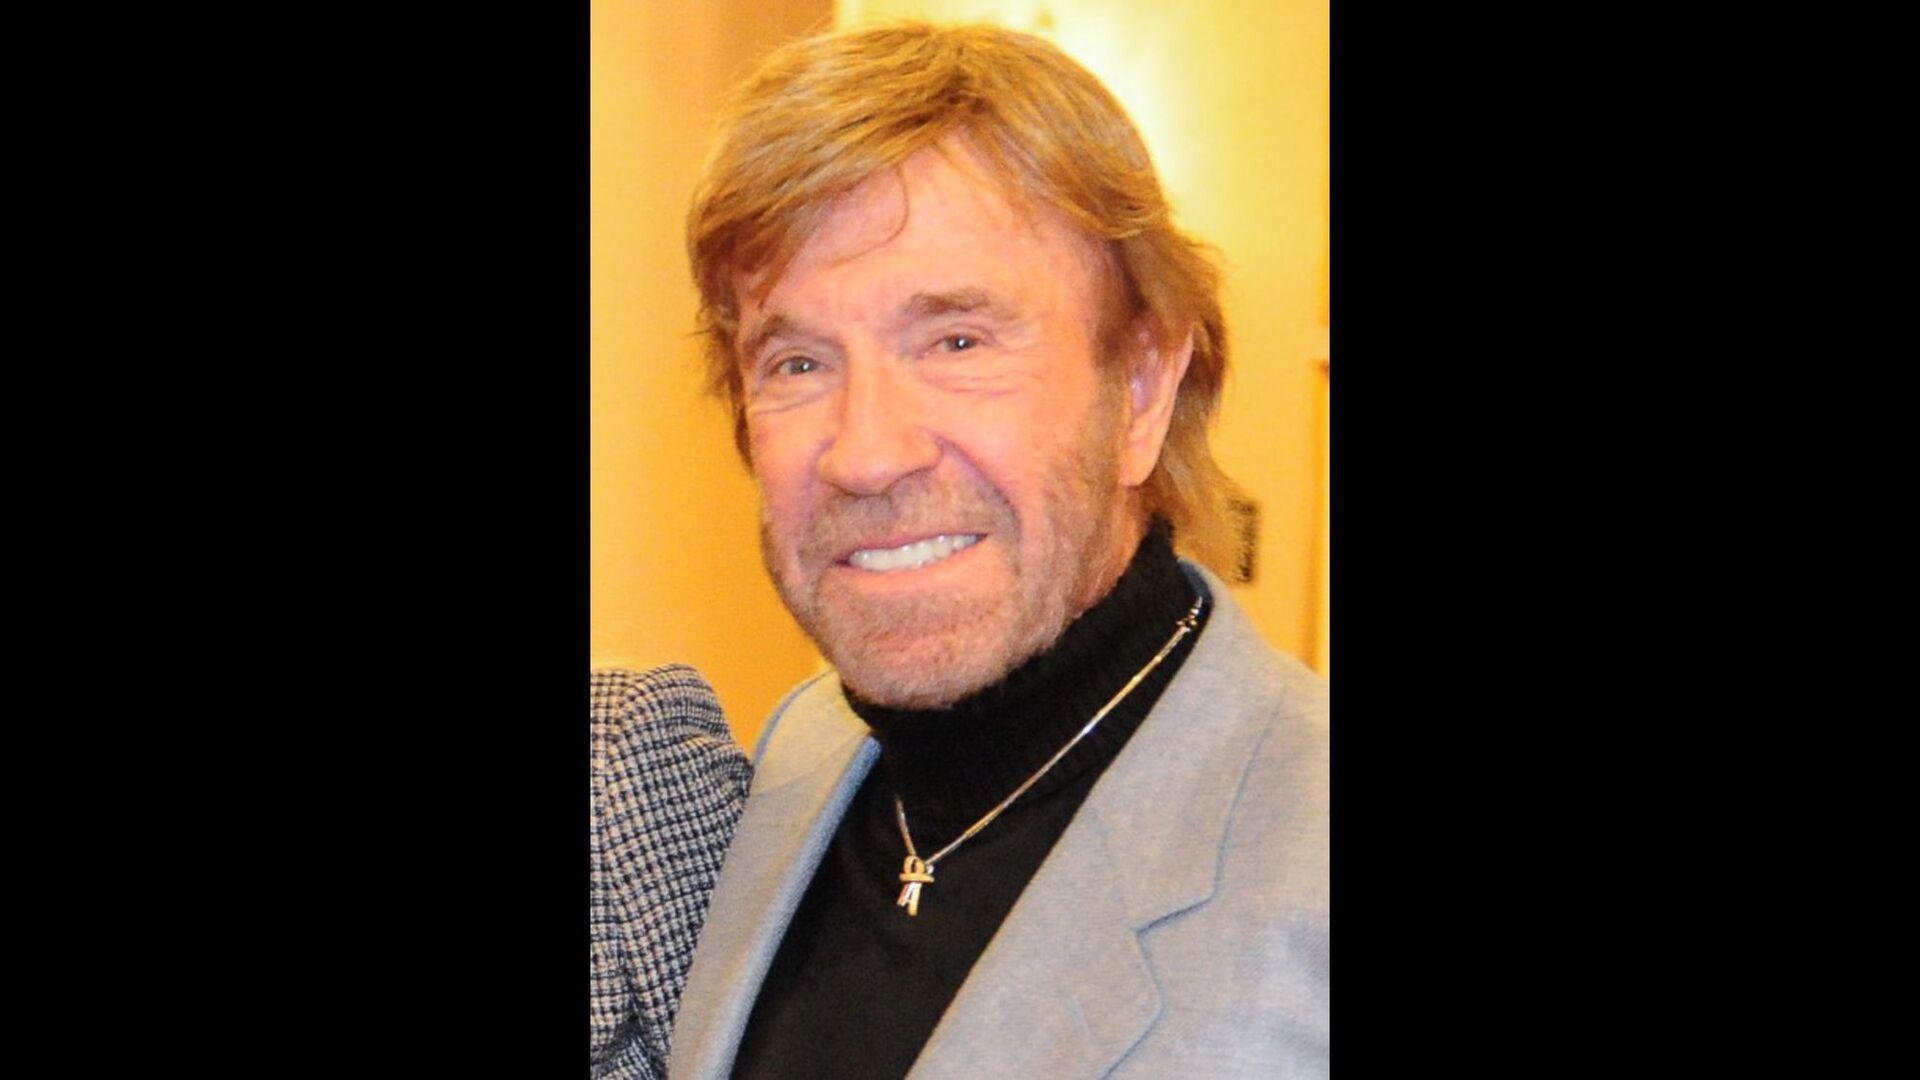 CONCRETE STORIES VS. ABSTRACT PROCESSES